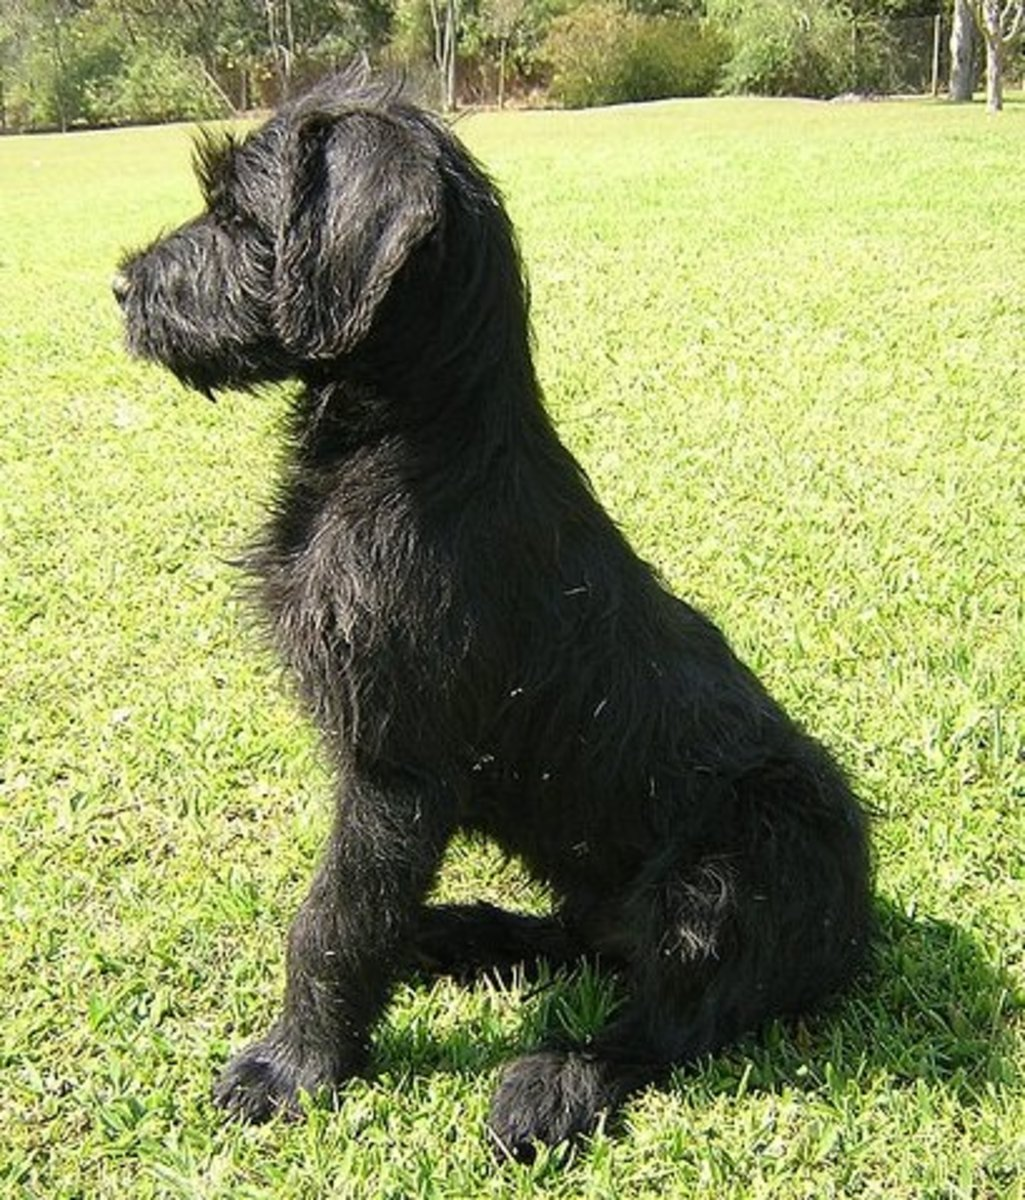 Giant Schnauzer puppy.